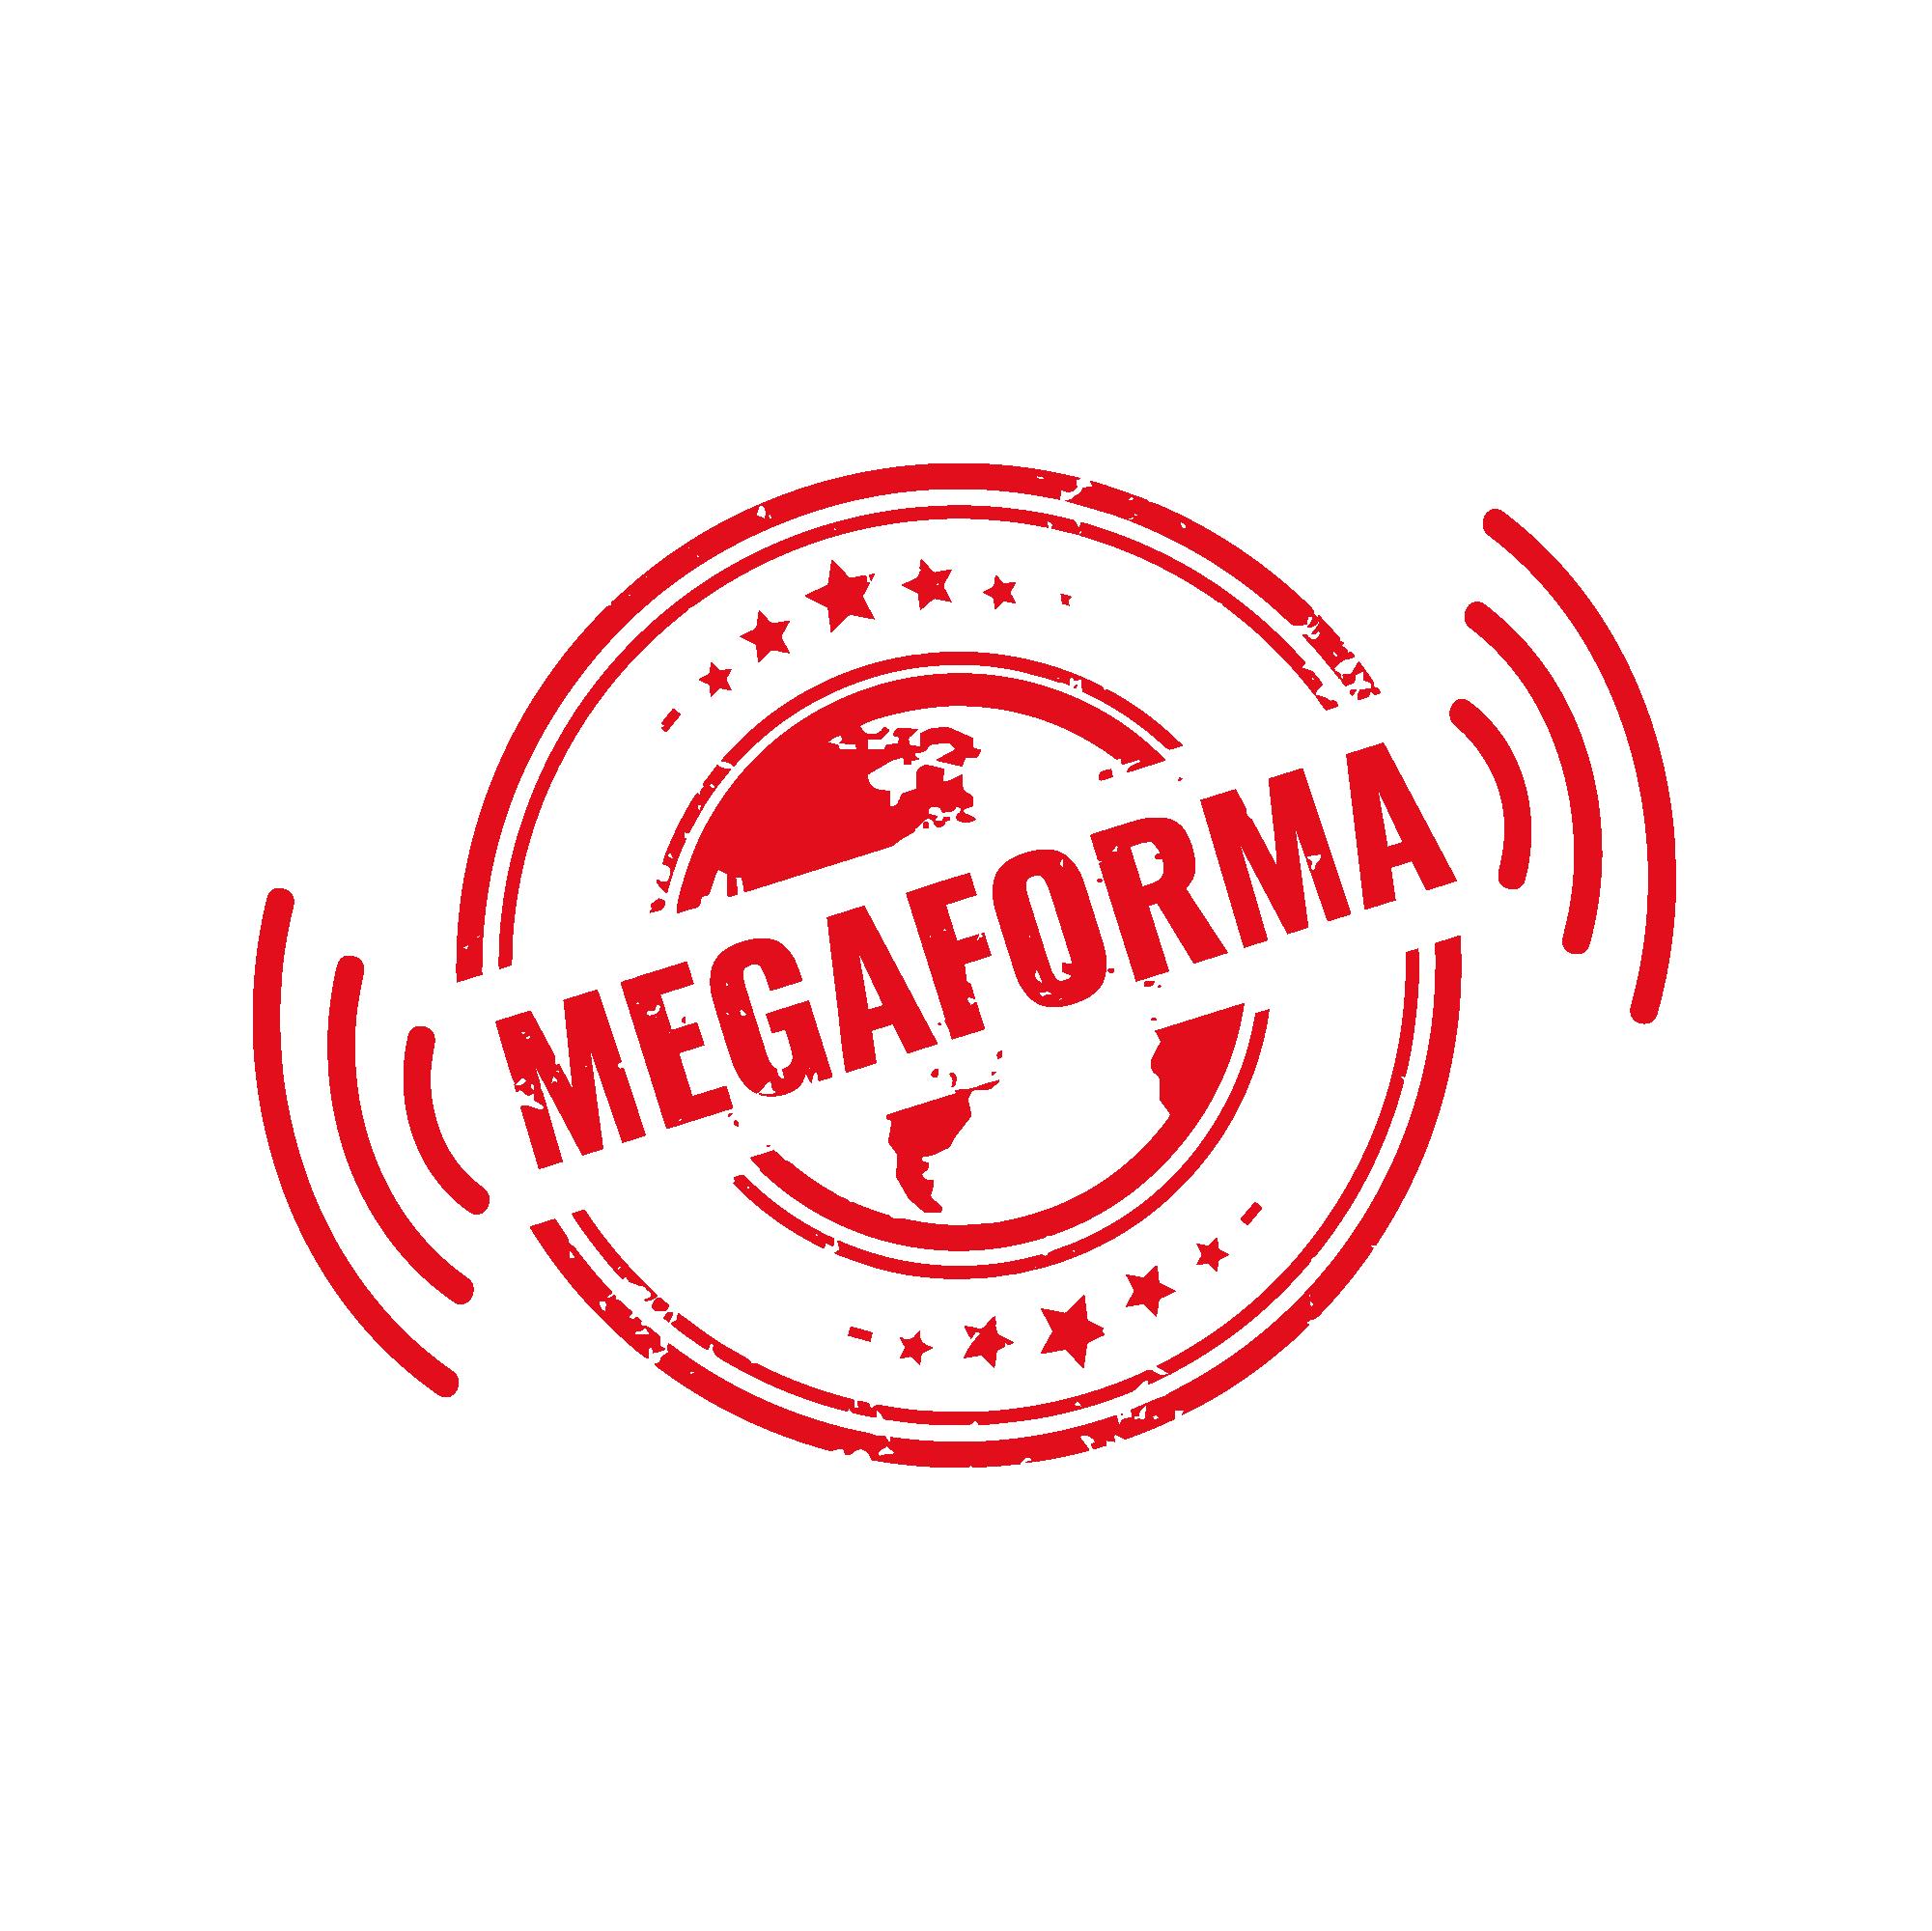 Ogłoszenia Megaforma